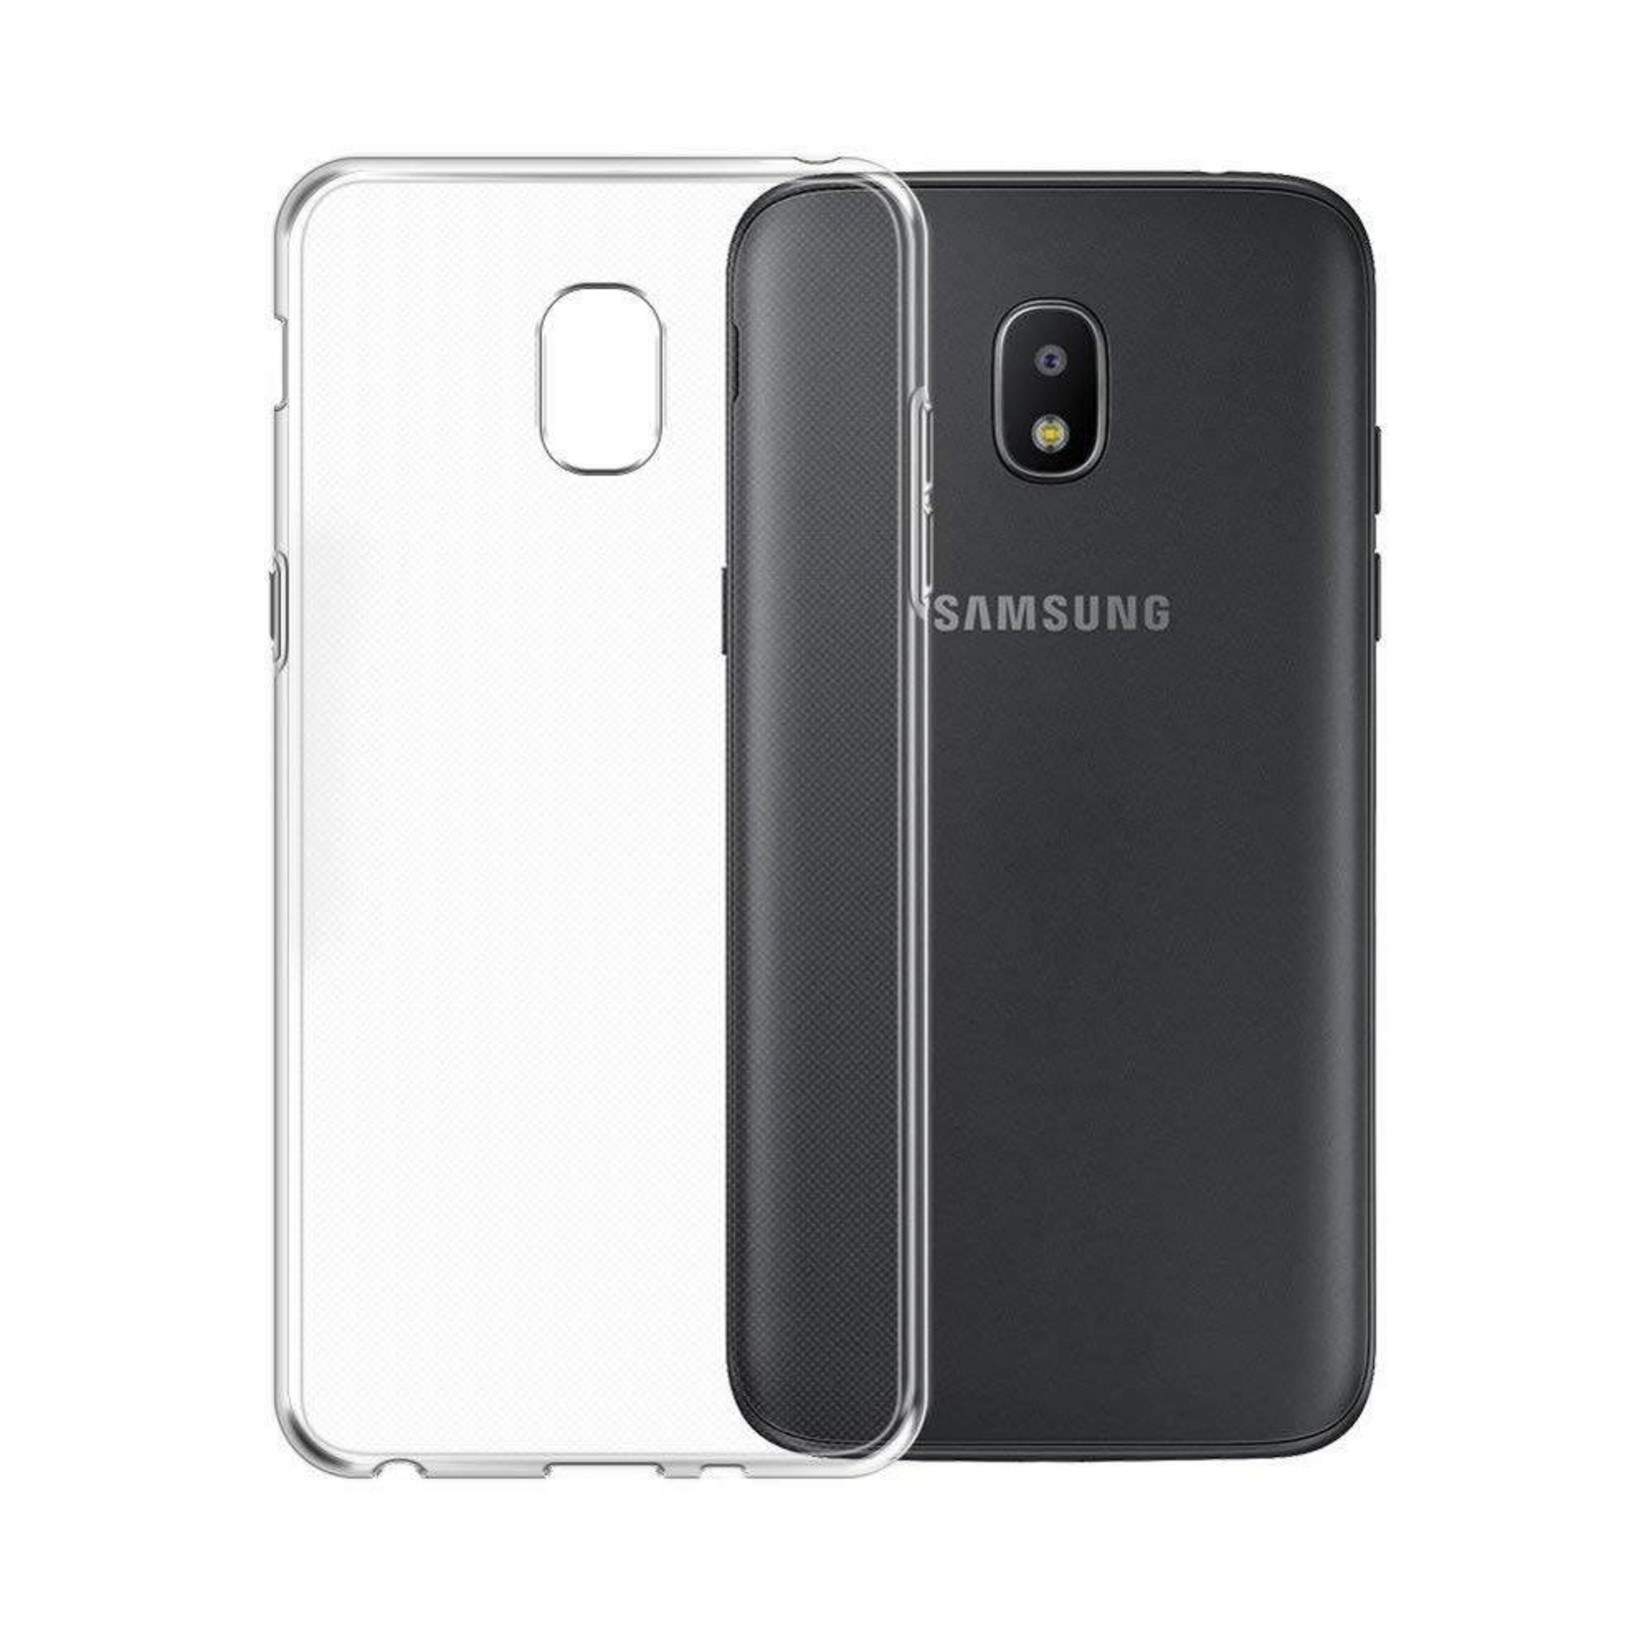 Colorfone Hoesje CoolSkin3T voor Samsung Galaxy J7 2018 Tr. Wit